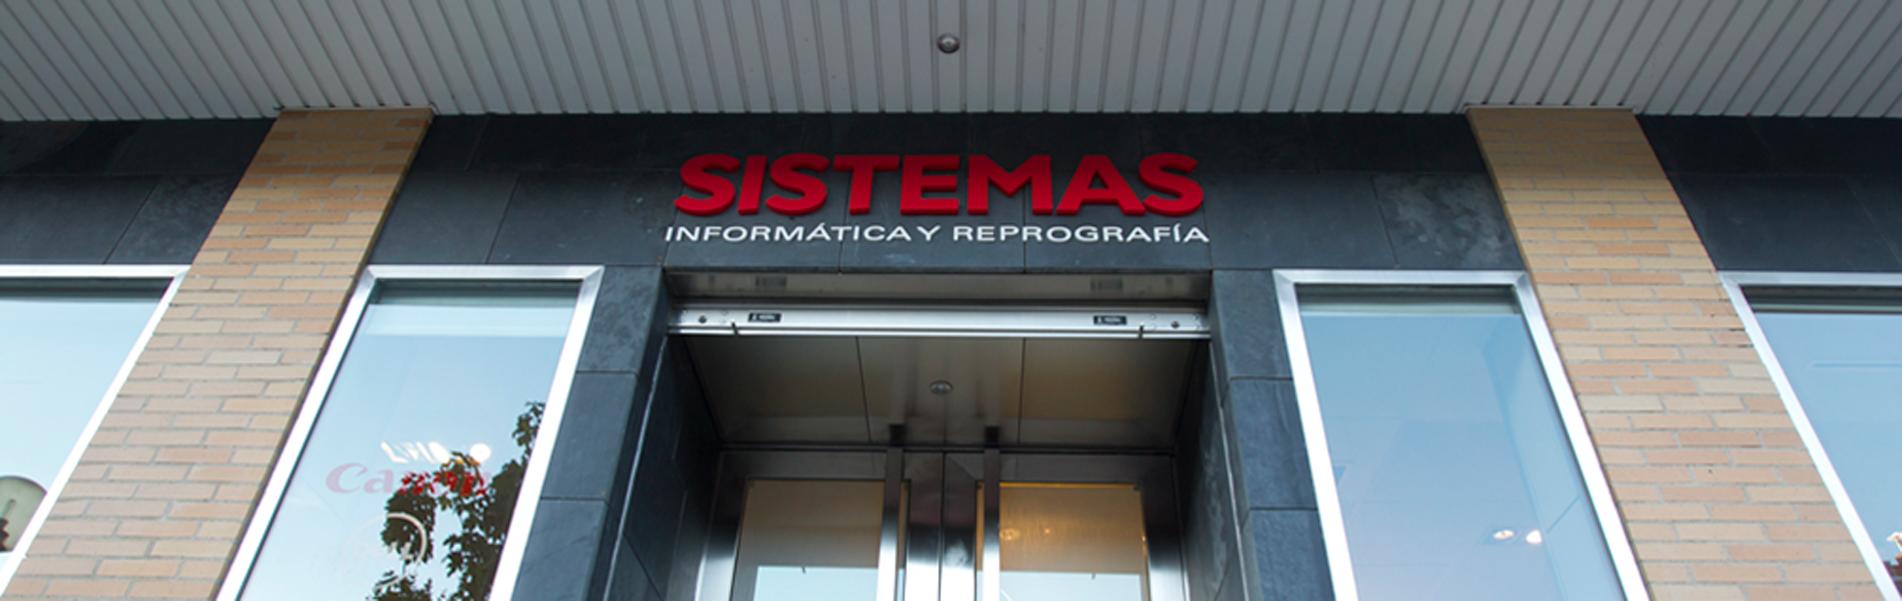 sistemas informatica - Sistemas informática